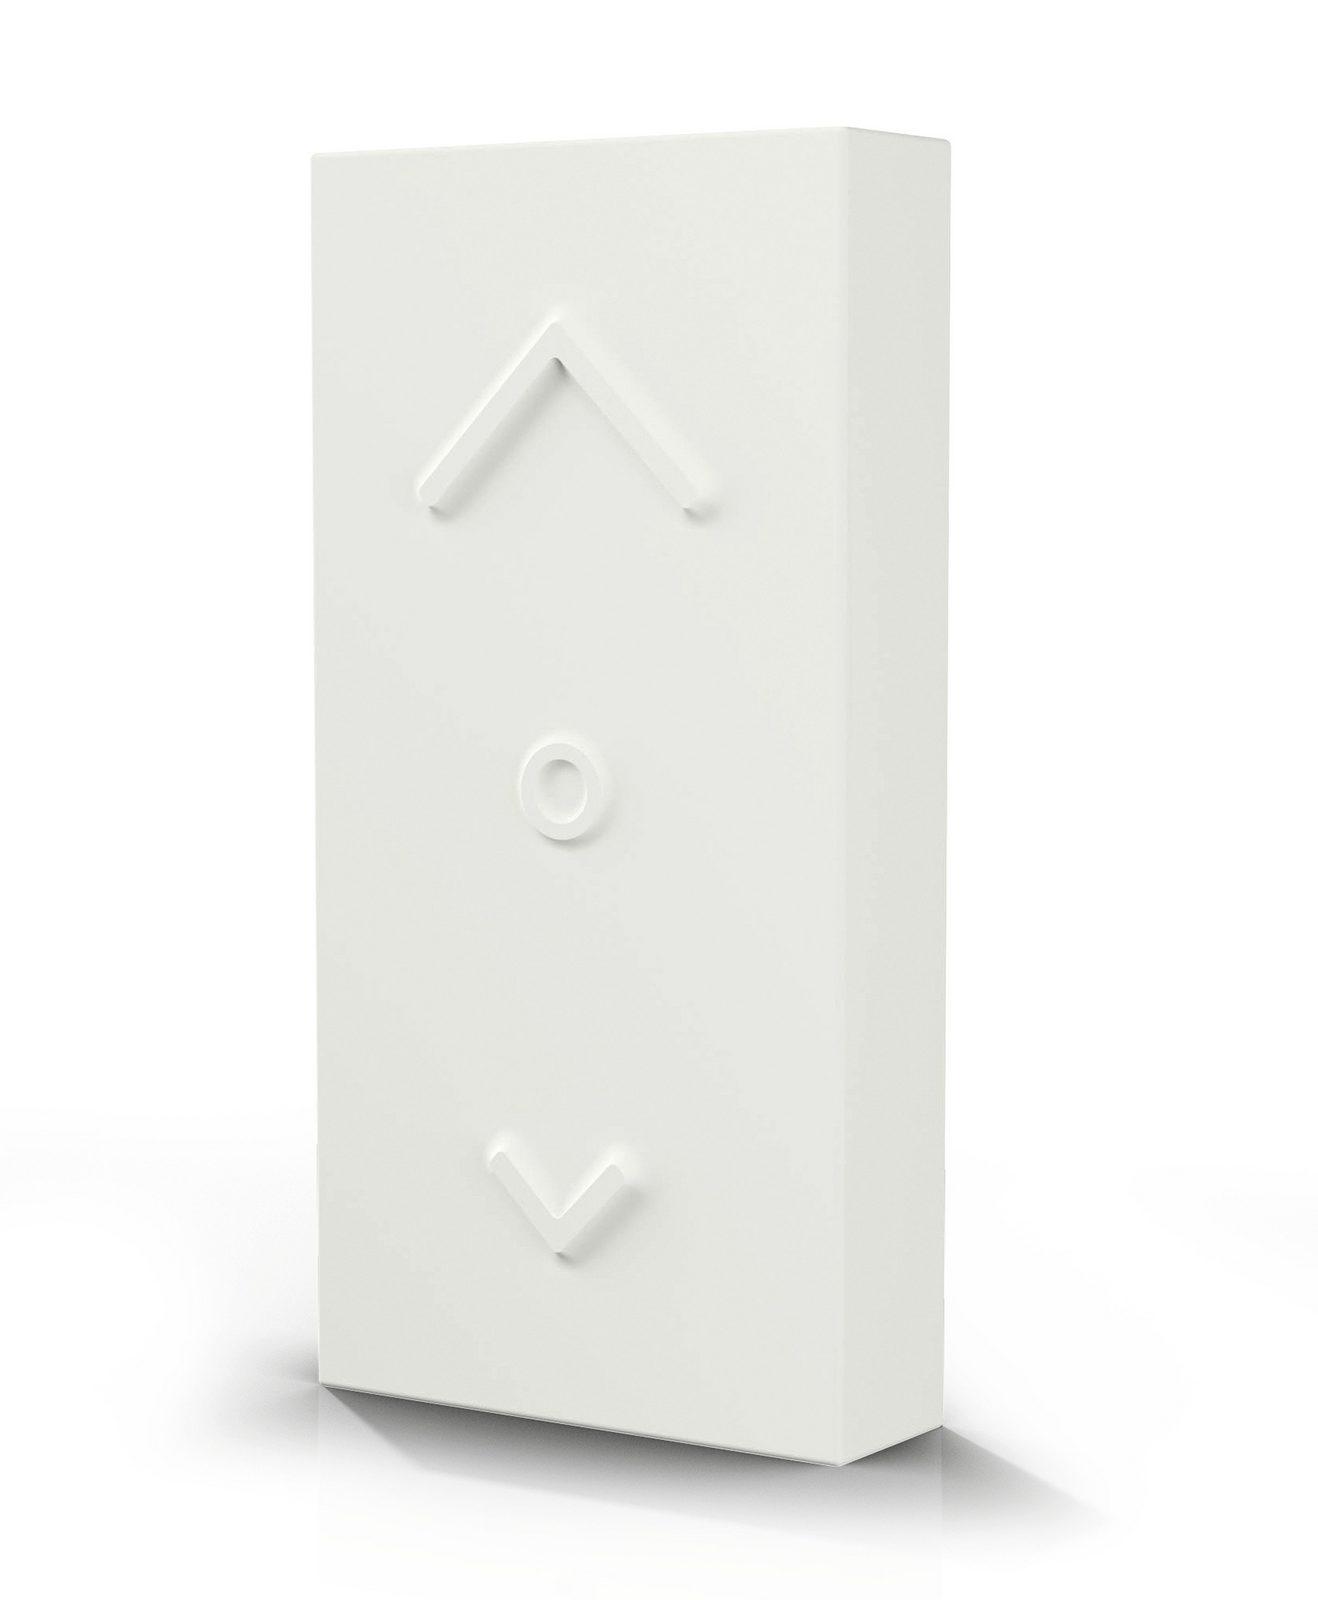 Osram SMART+ Switch Mini Fernbedienung weiß